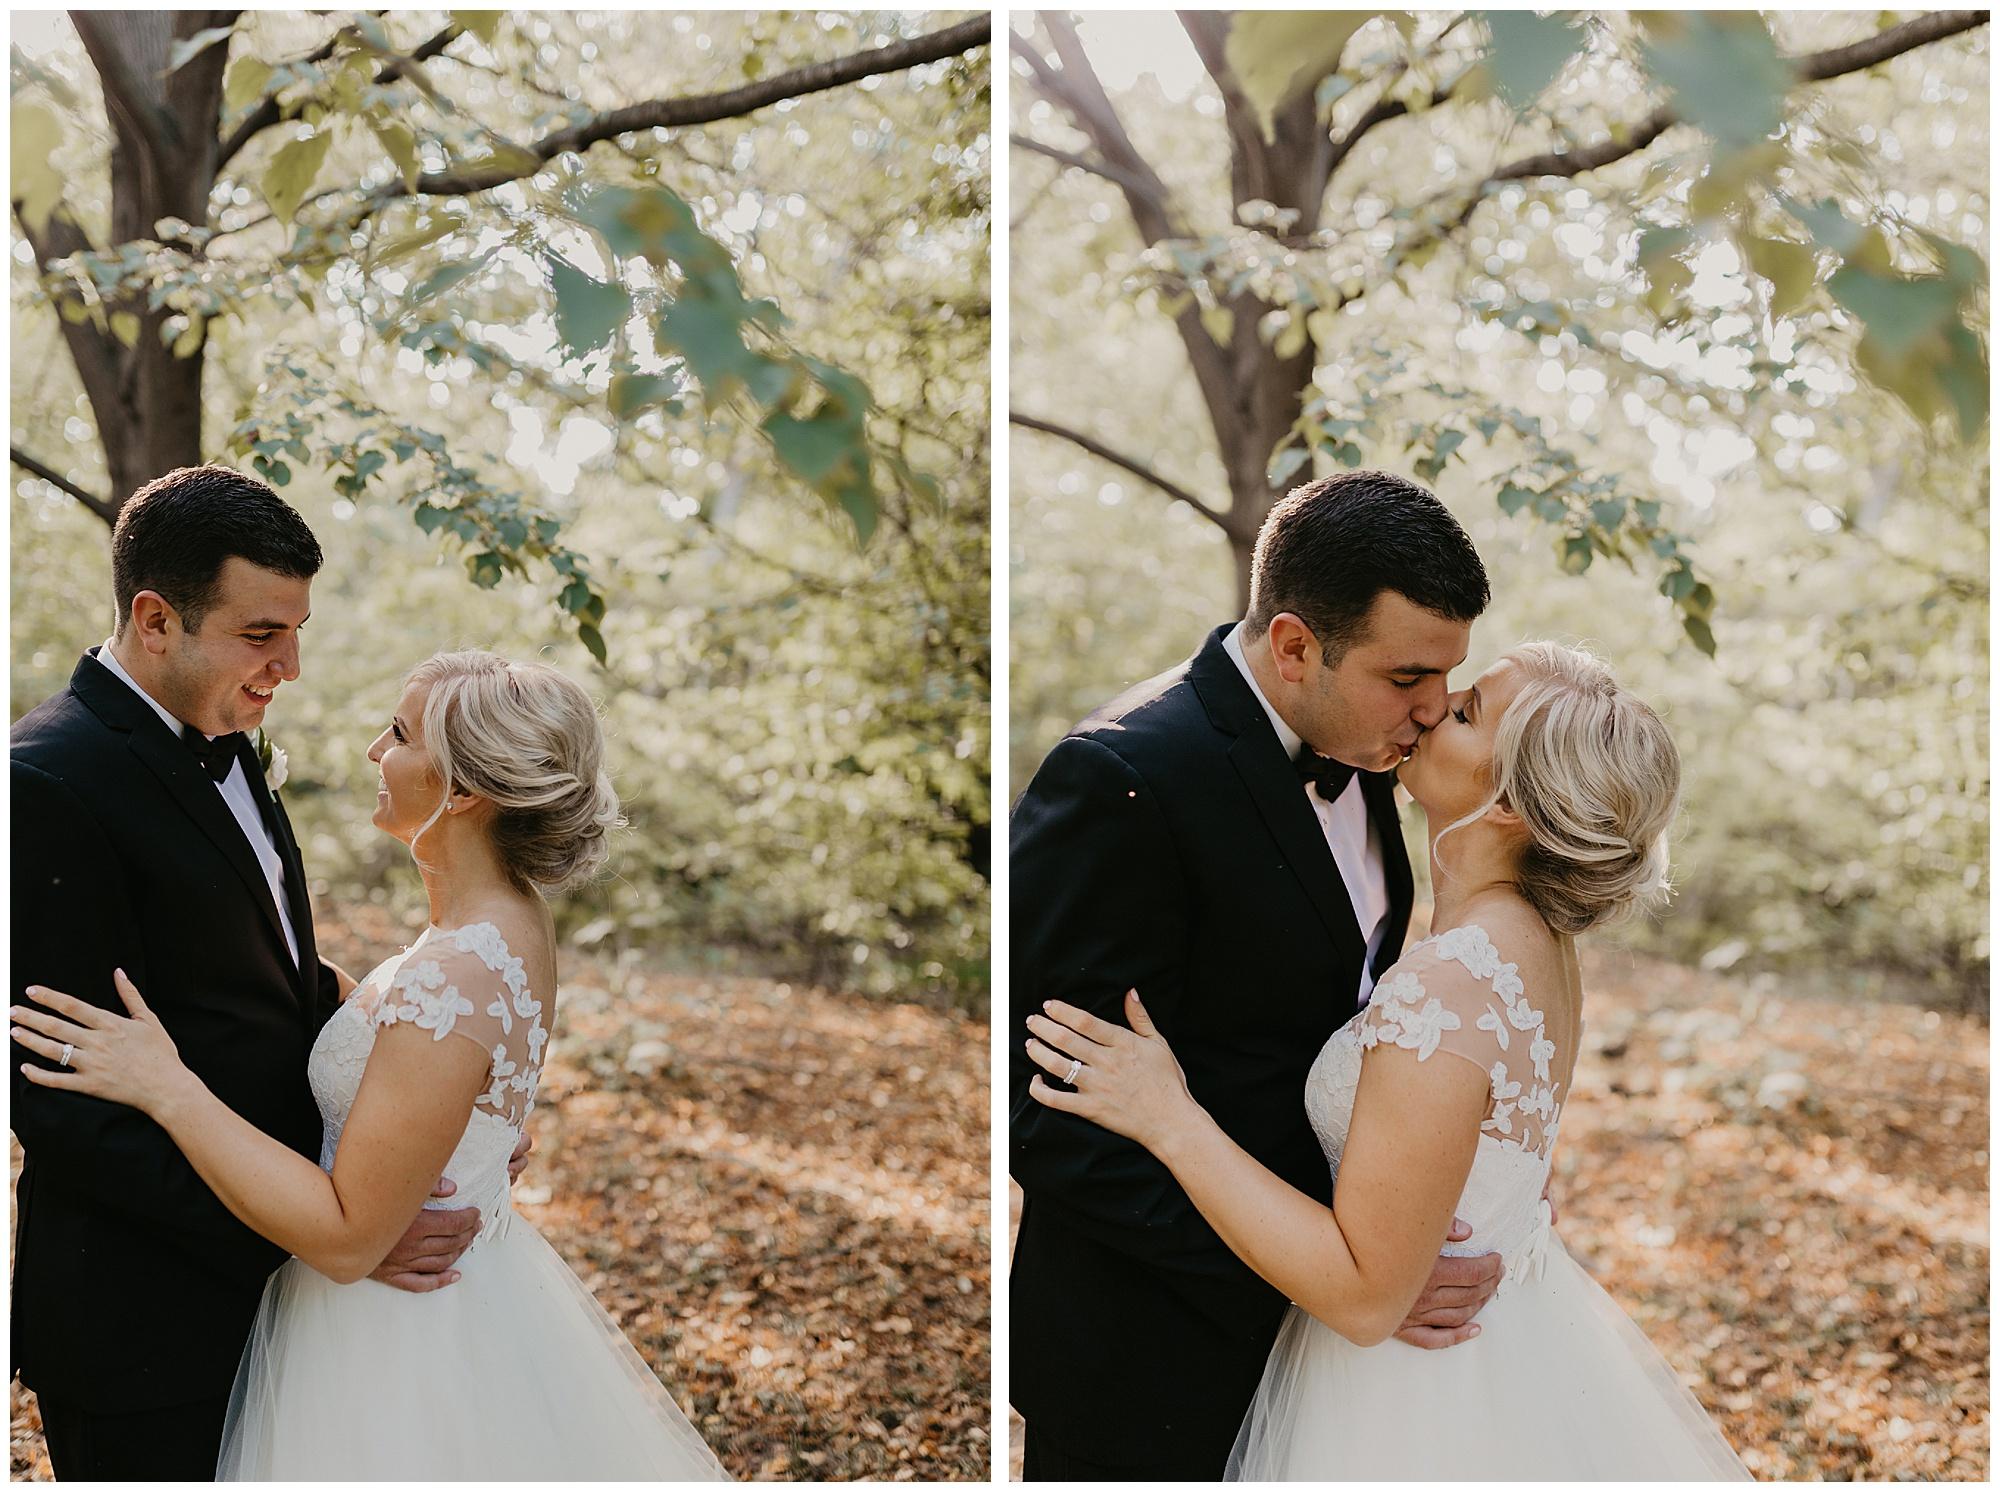 pear_tree_estate_wedding_champaign_il_wright_photographs_jj_0014.jpg